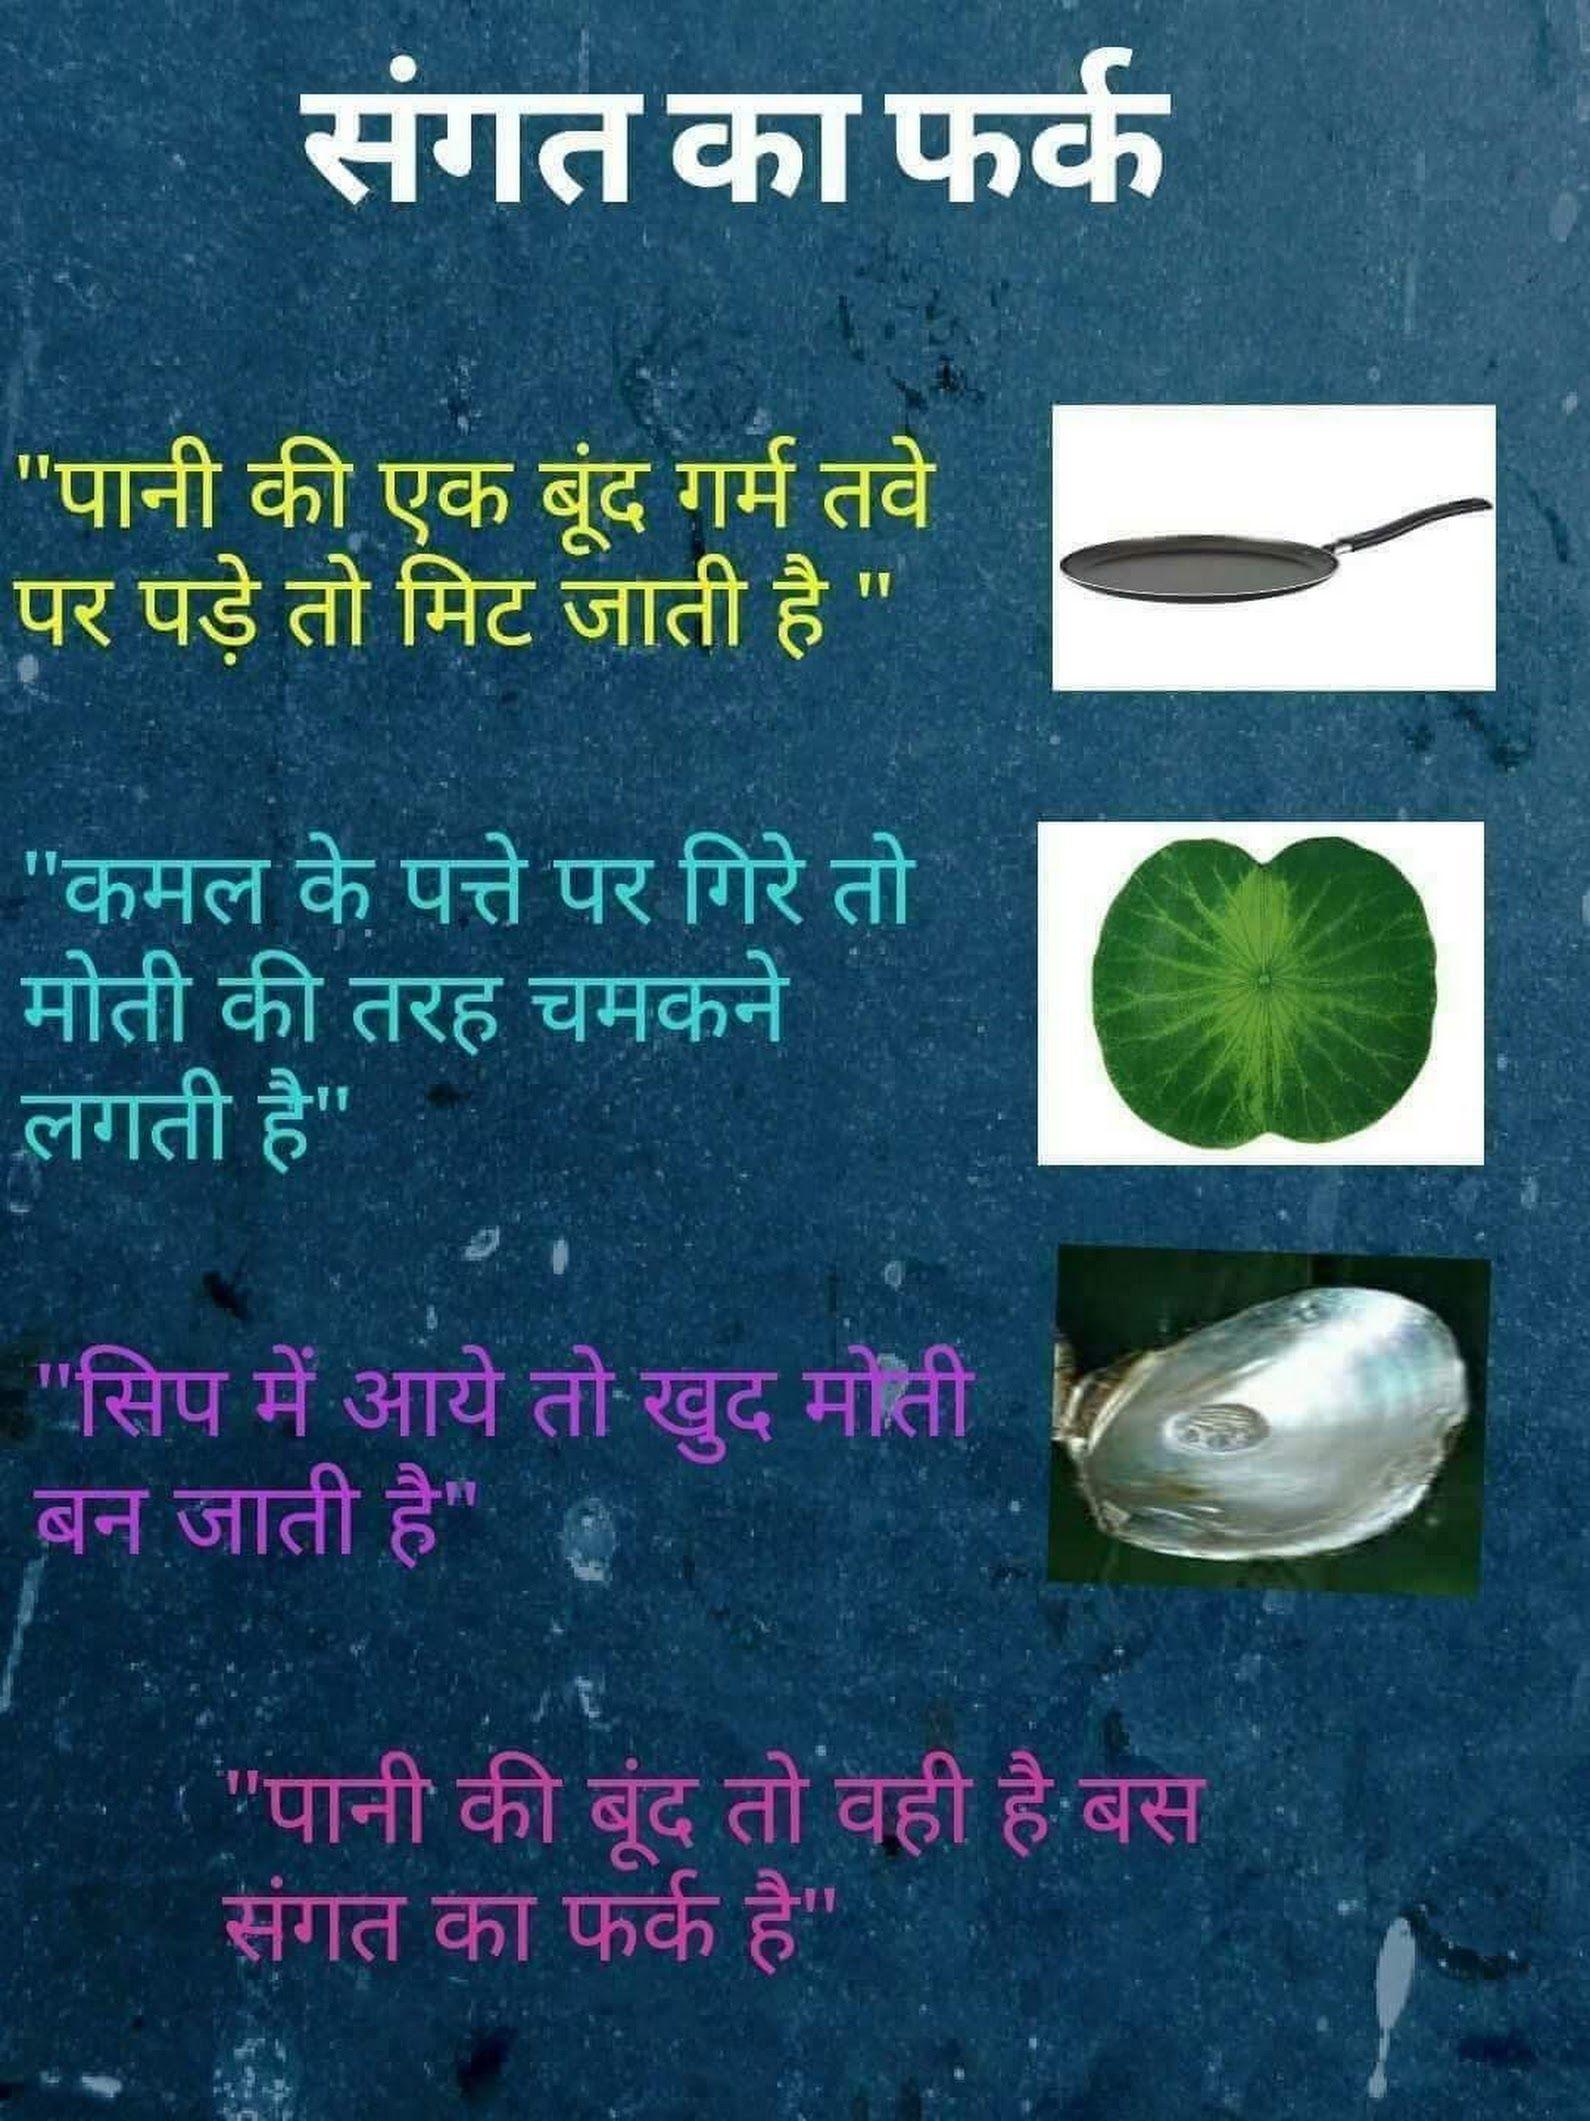 अस्मिता कुलकर्णी - Google+ | Hindi quotes | Hindi